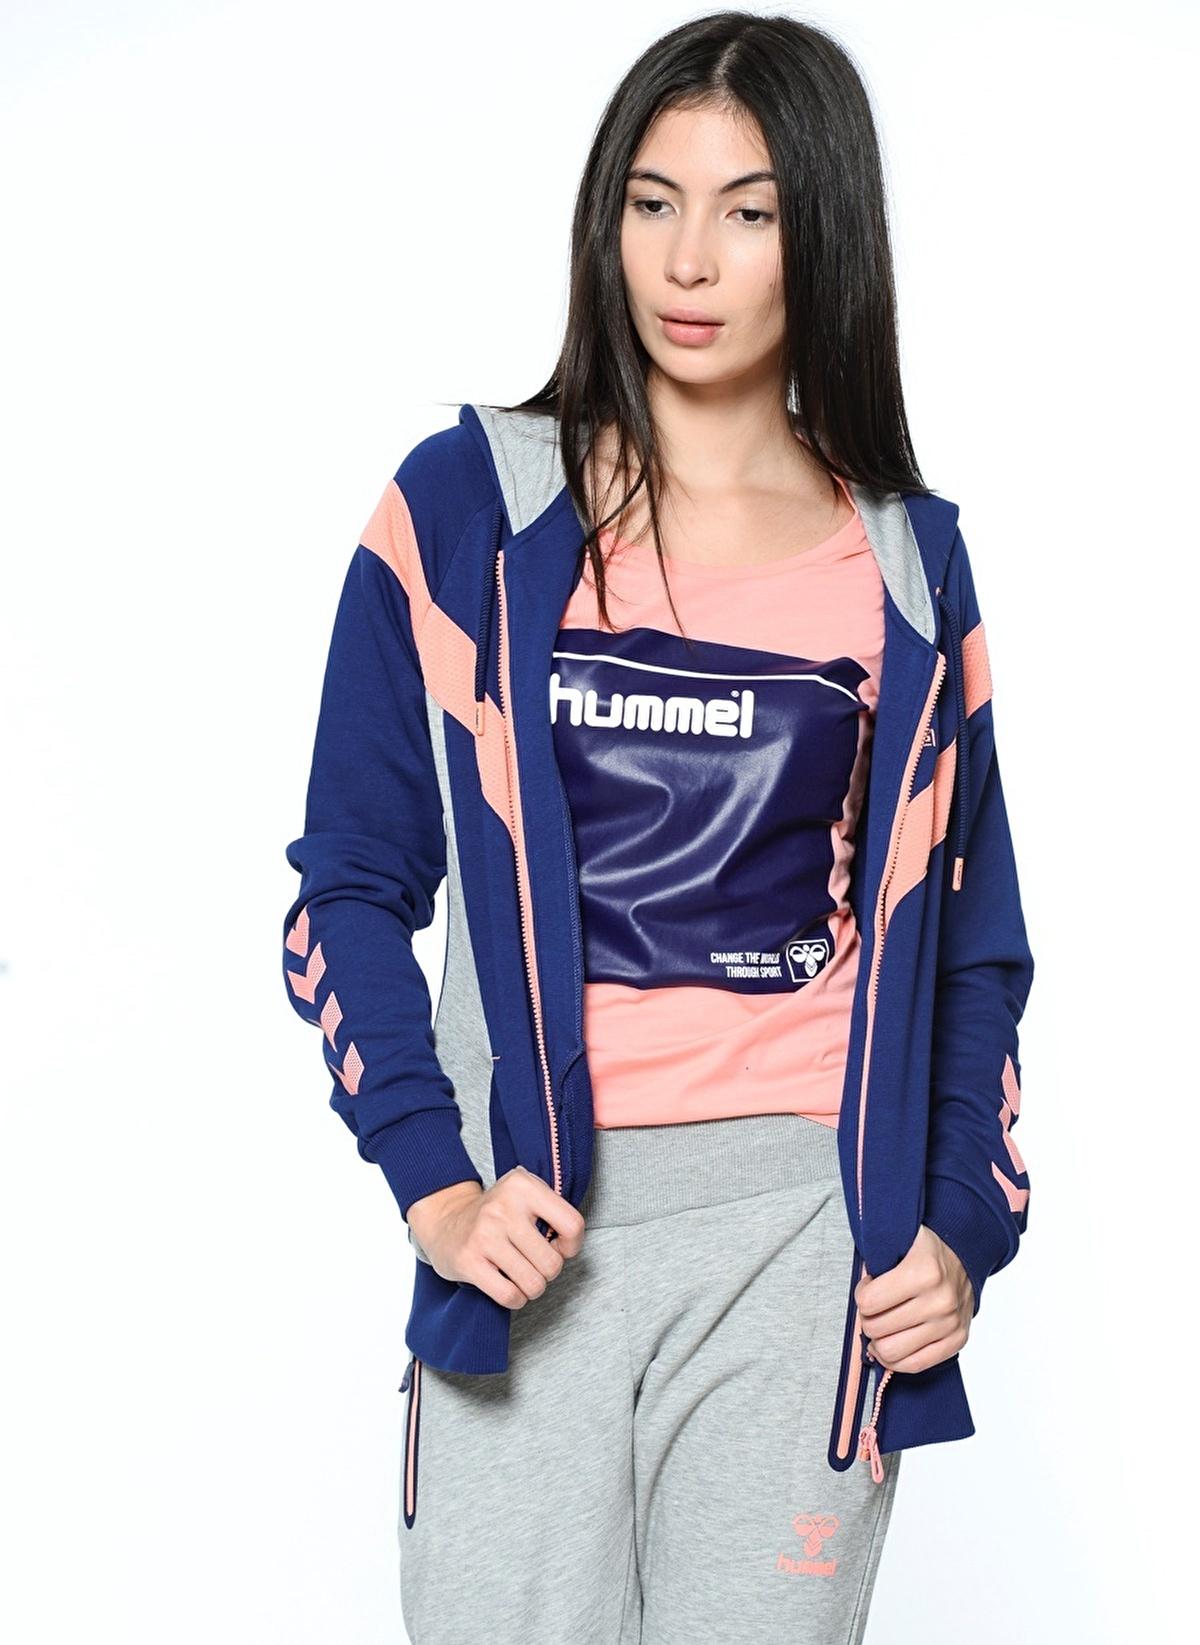 Hummel Fermuarlı Kapüşonlu Sweatshirt 33496-8274 Demi Zip Hoodie – 119.95 TL